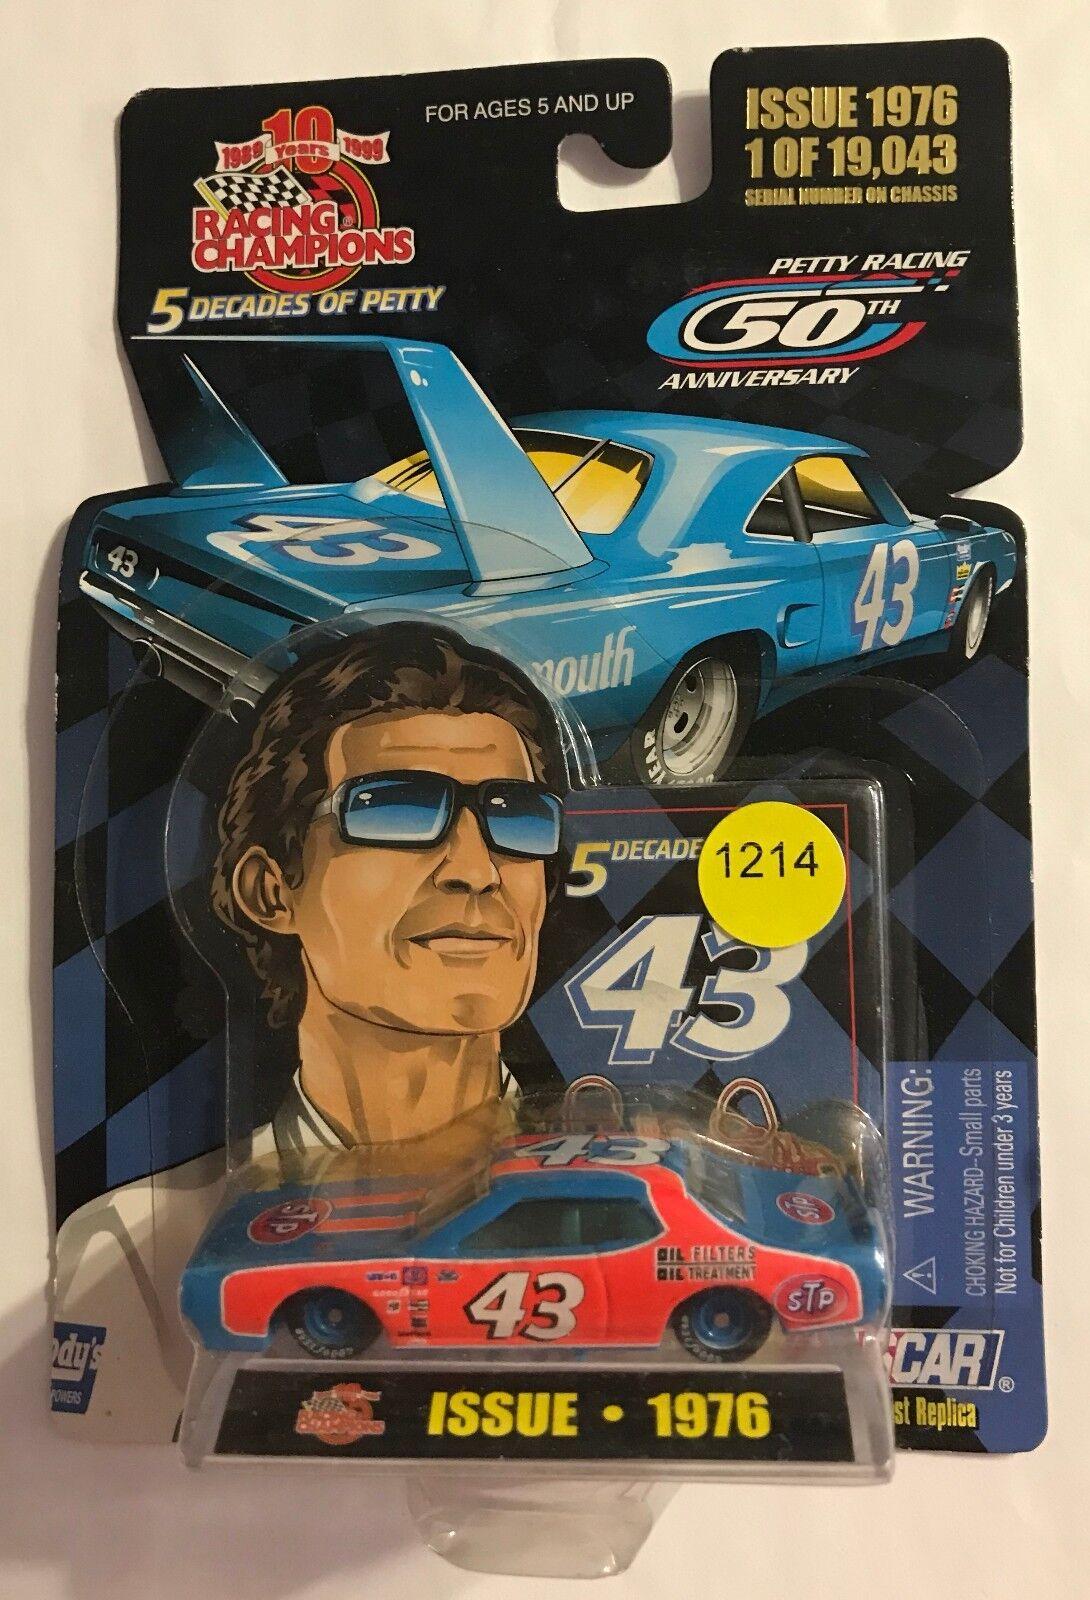 64TH RACING RACING RACING CHAMPION 5 DECADES OF PETTY 1976  RICHARD PETTY dcddd0